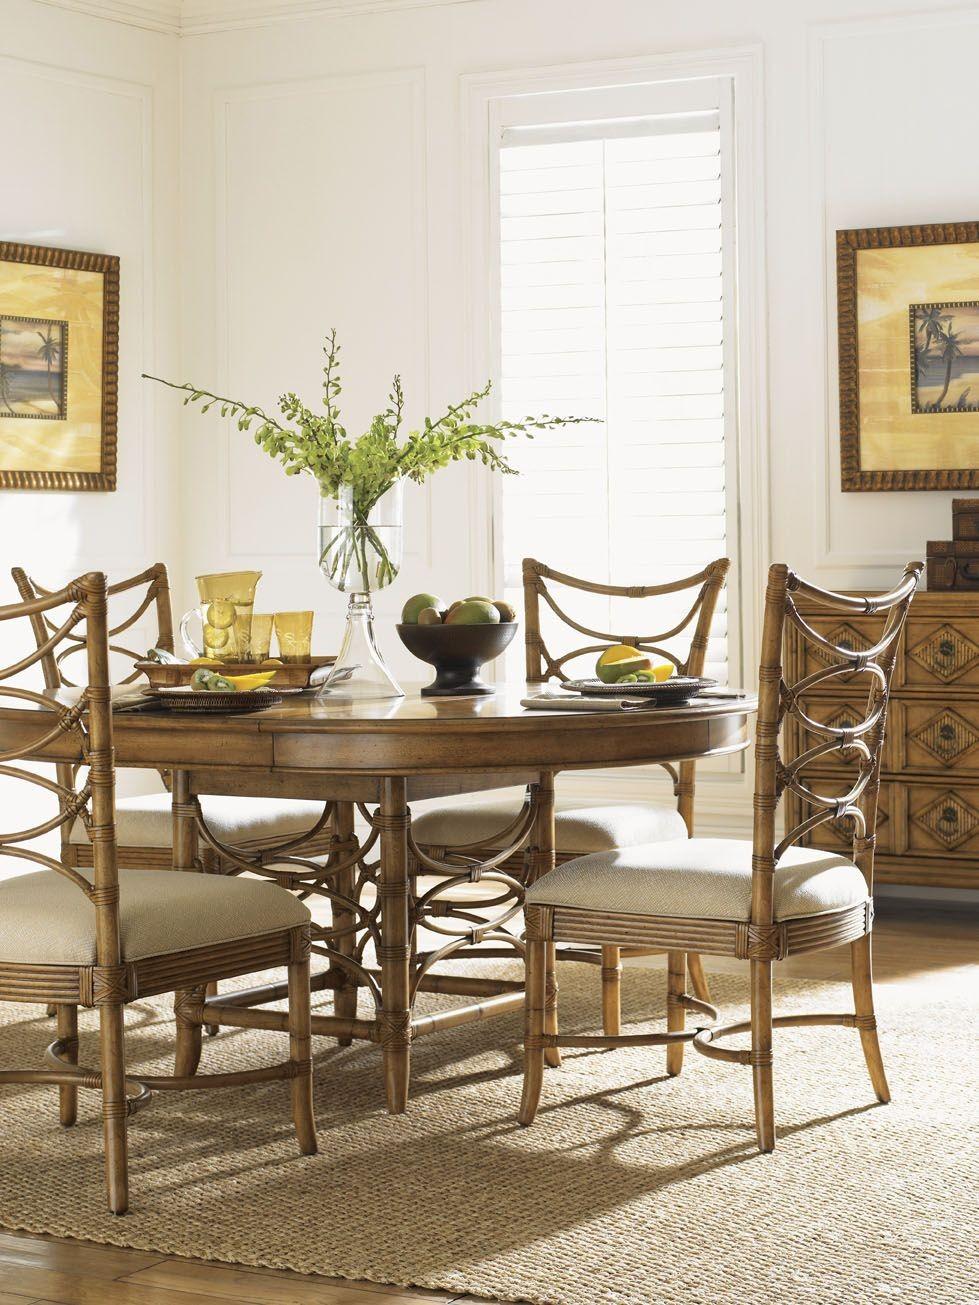 beach house dining room sets | Beach House Coconut Grove Extendable Round Dining Room Set ...